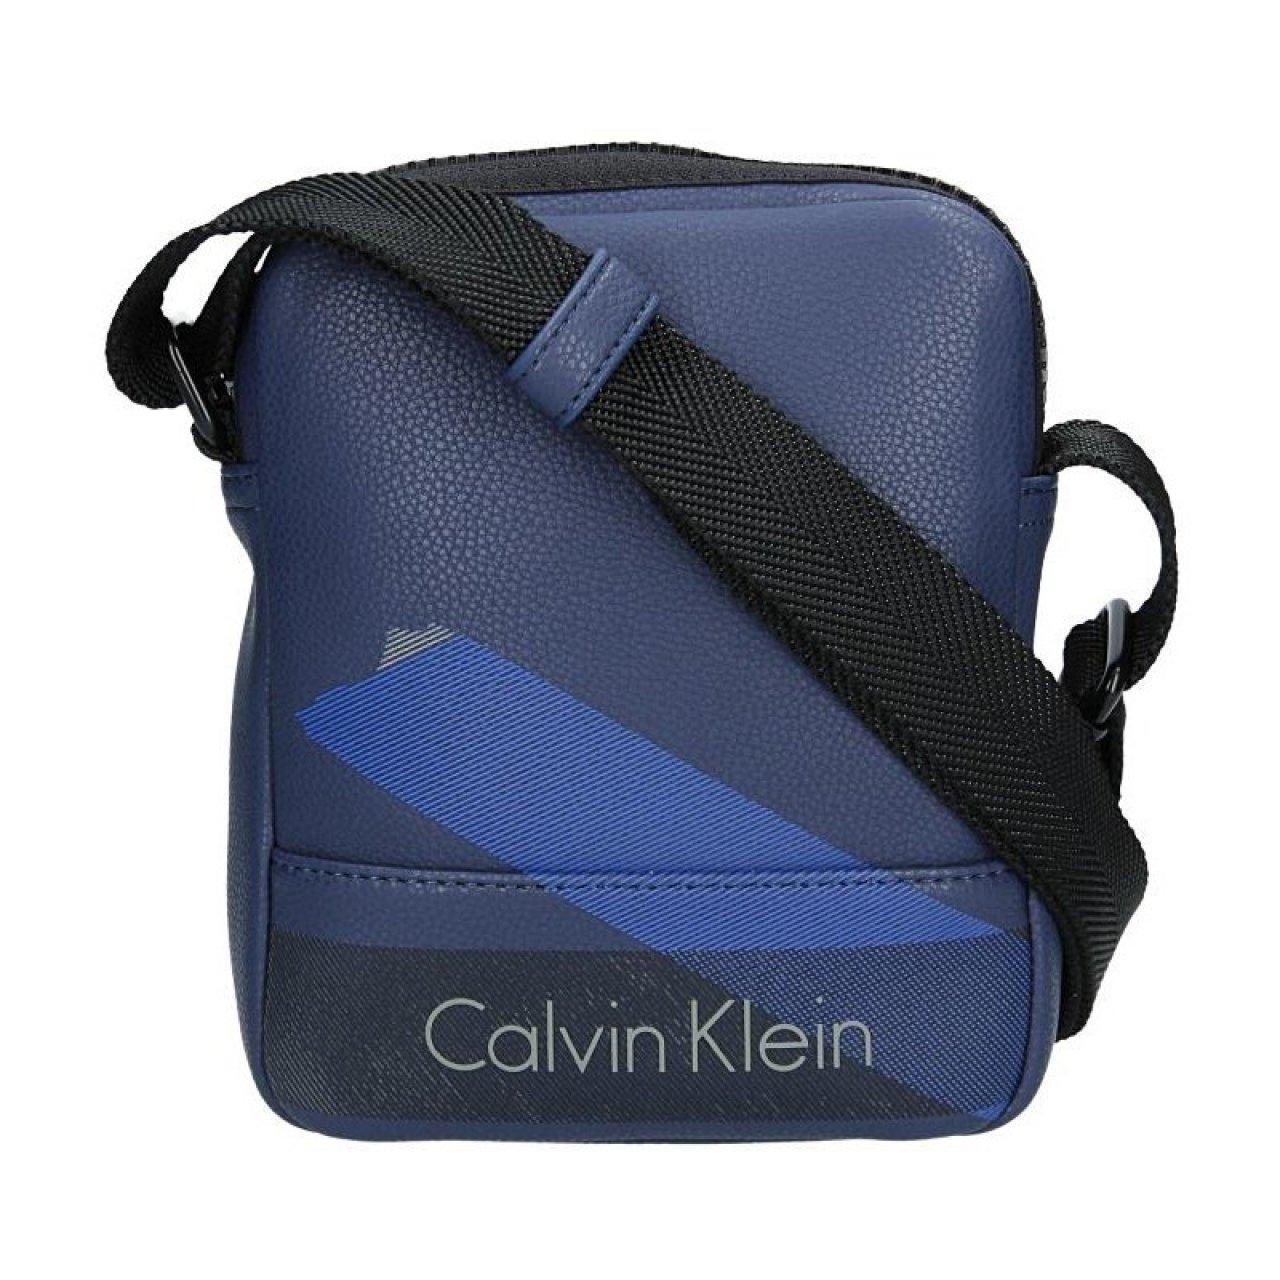 Pánská taška přes rameno Calvin Klein Raul - modrá  8c66a26a56